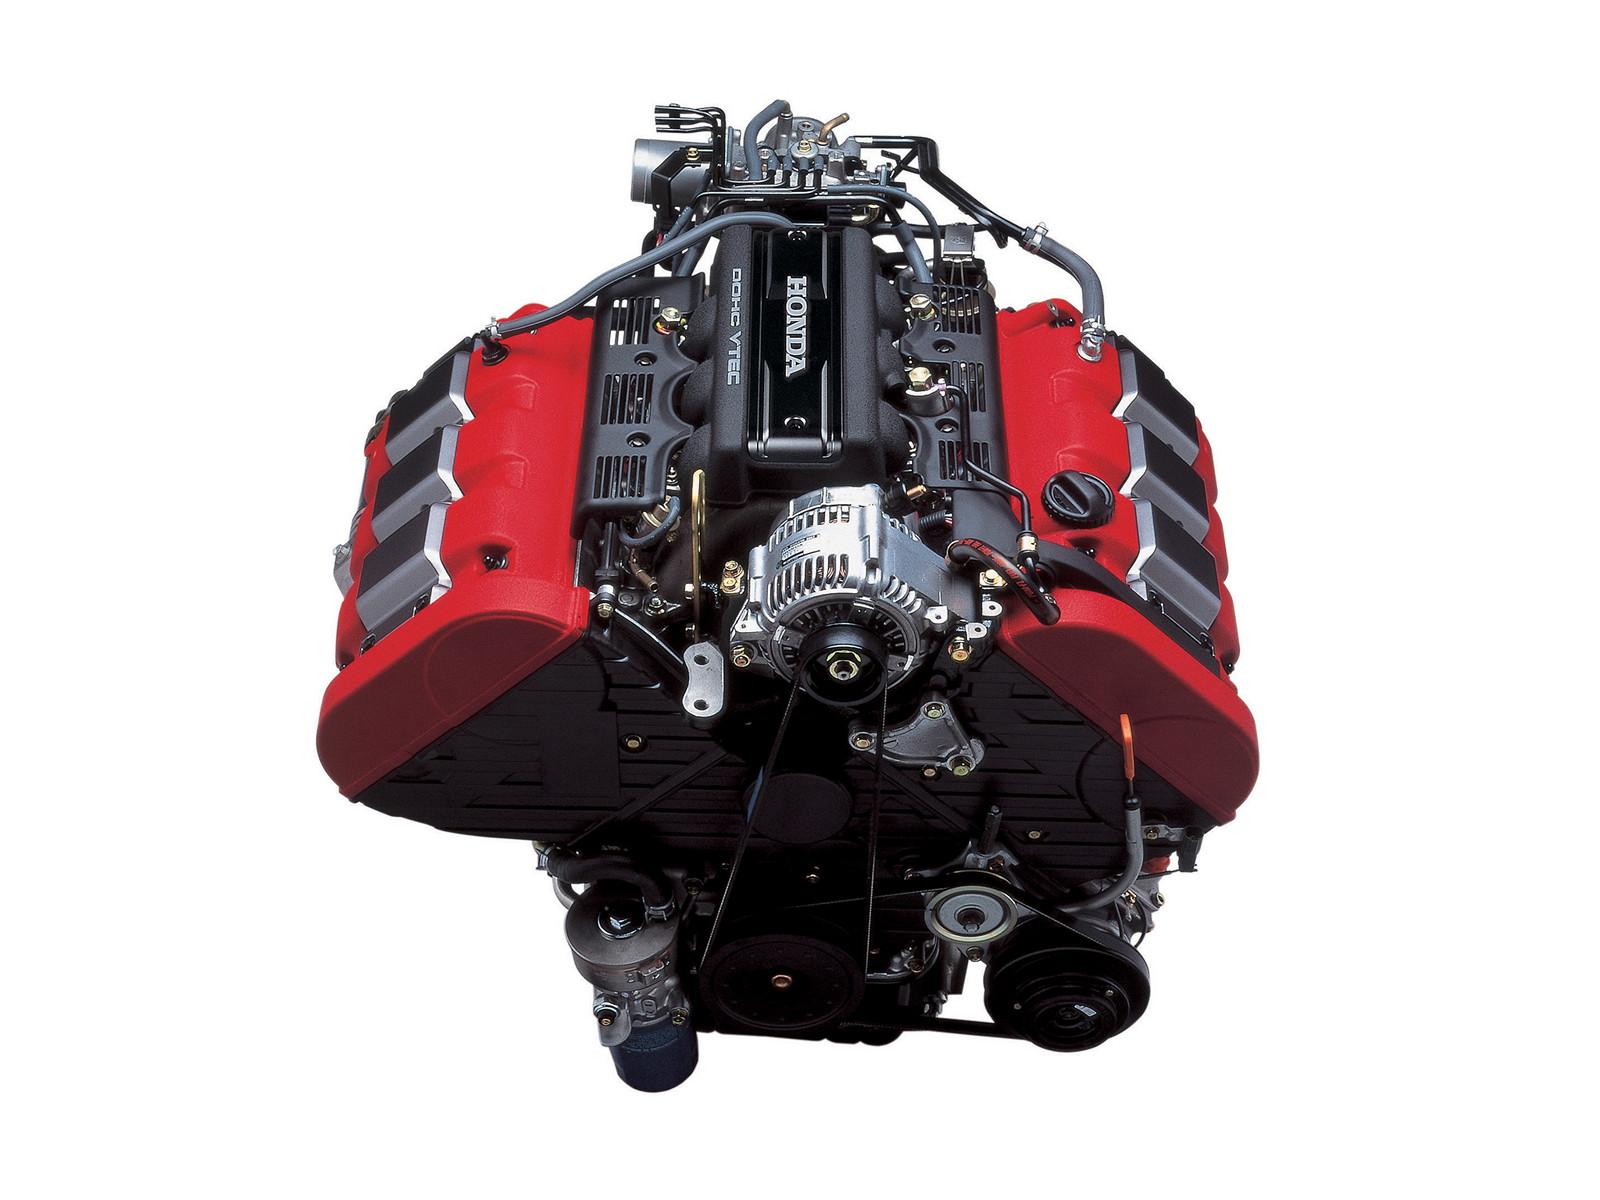 Honda C32B, VTEC DOHC, NSX, silnik V6, solidne, trwałe, niezawodne